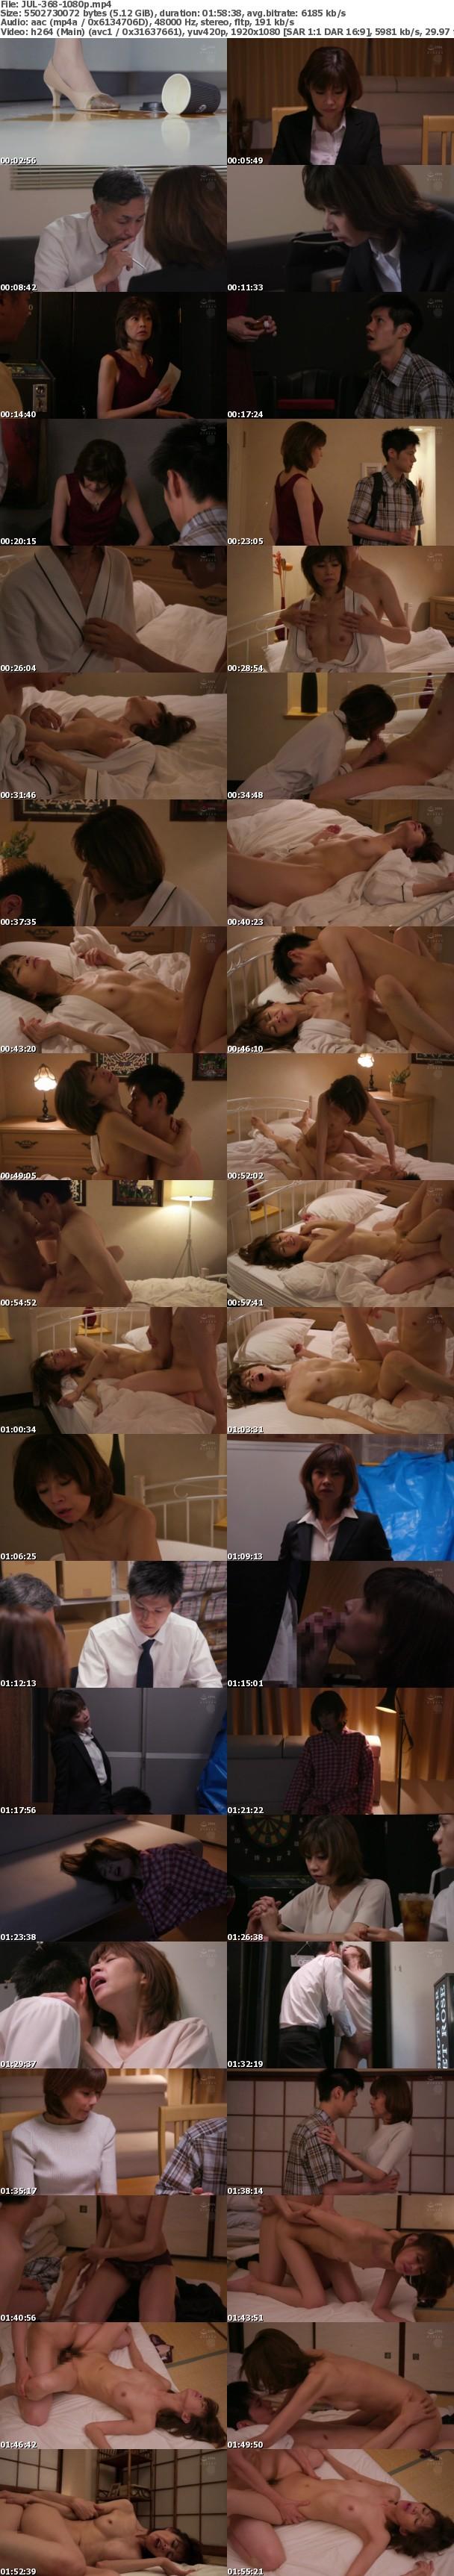 (Full HD) JUL-368 「ねぇ?あなた、本当に童貞なの?」~童貞詐欺にイカされ続けた人妻~ もちづきる美